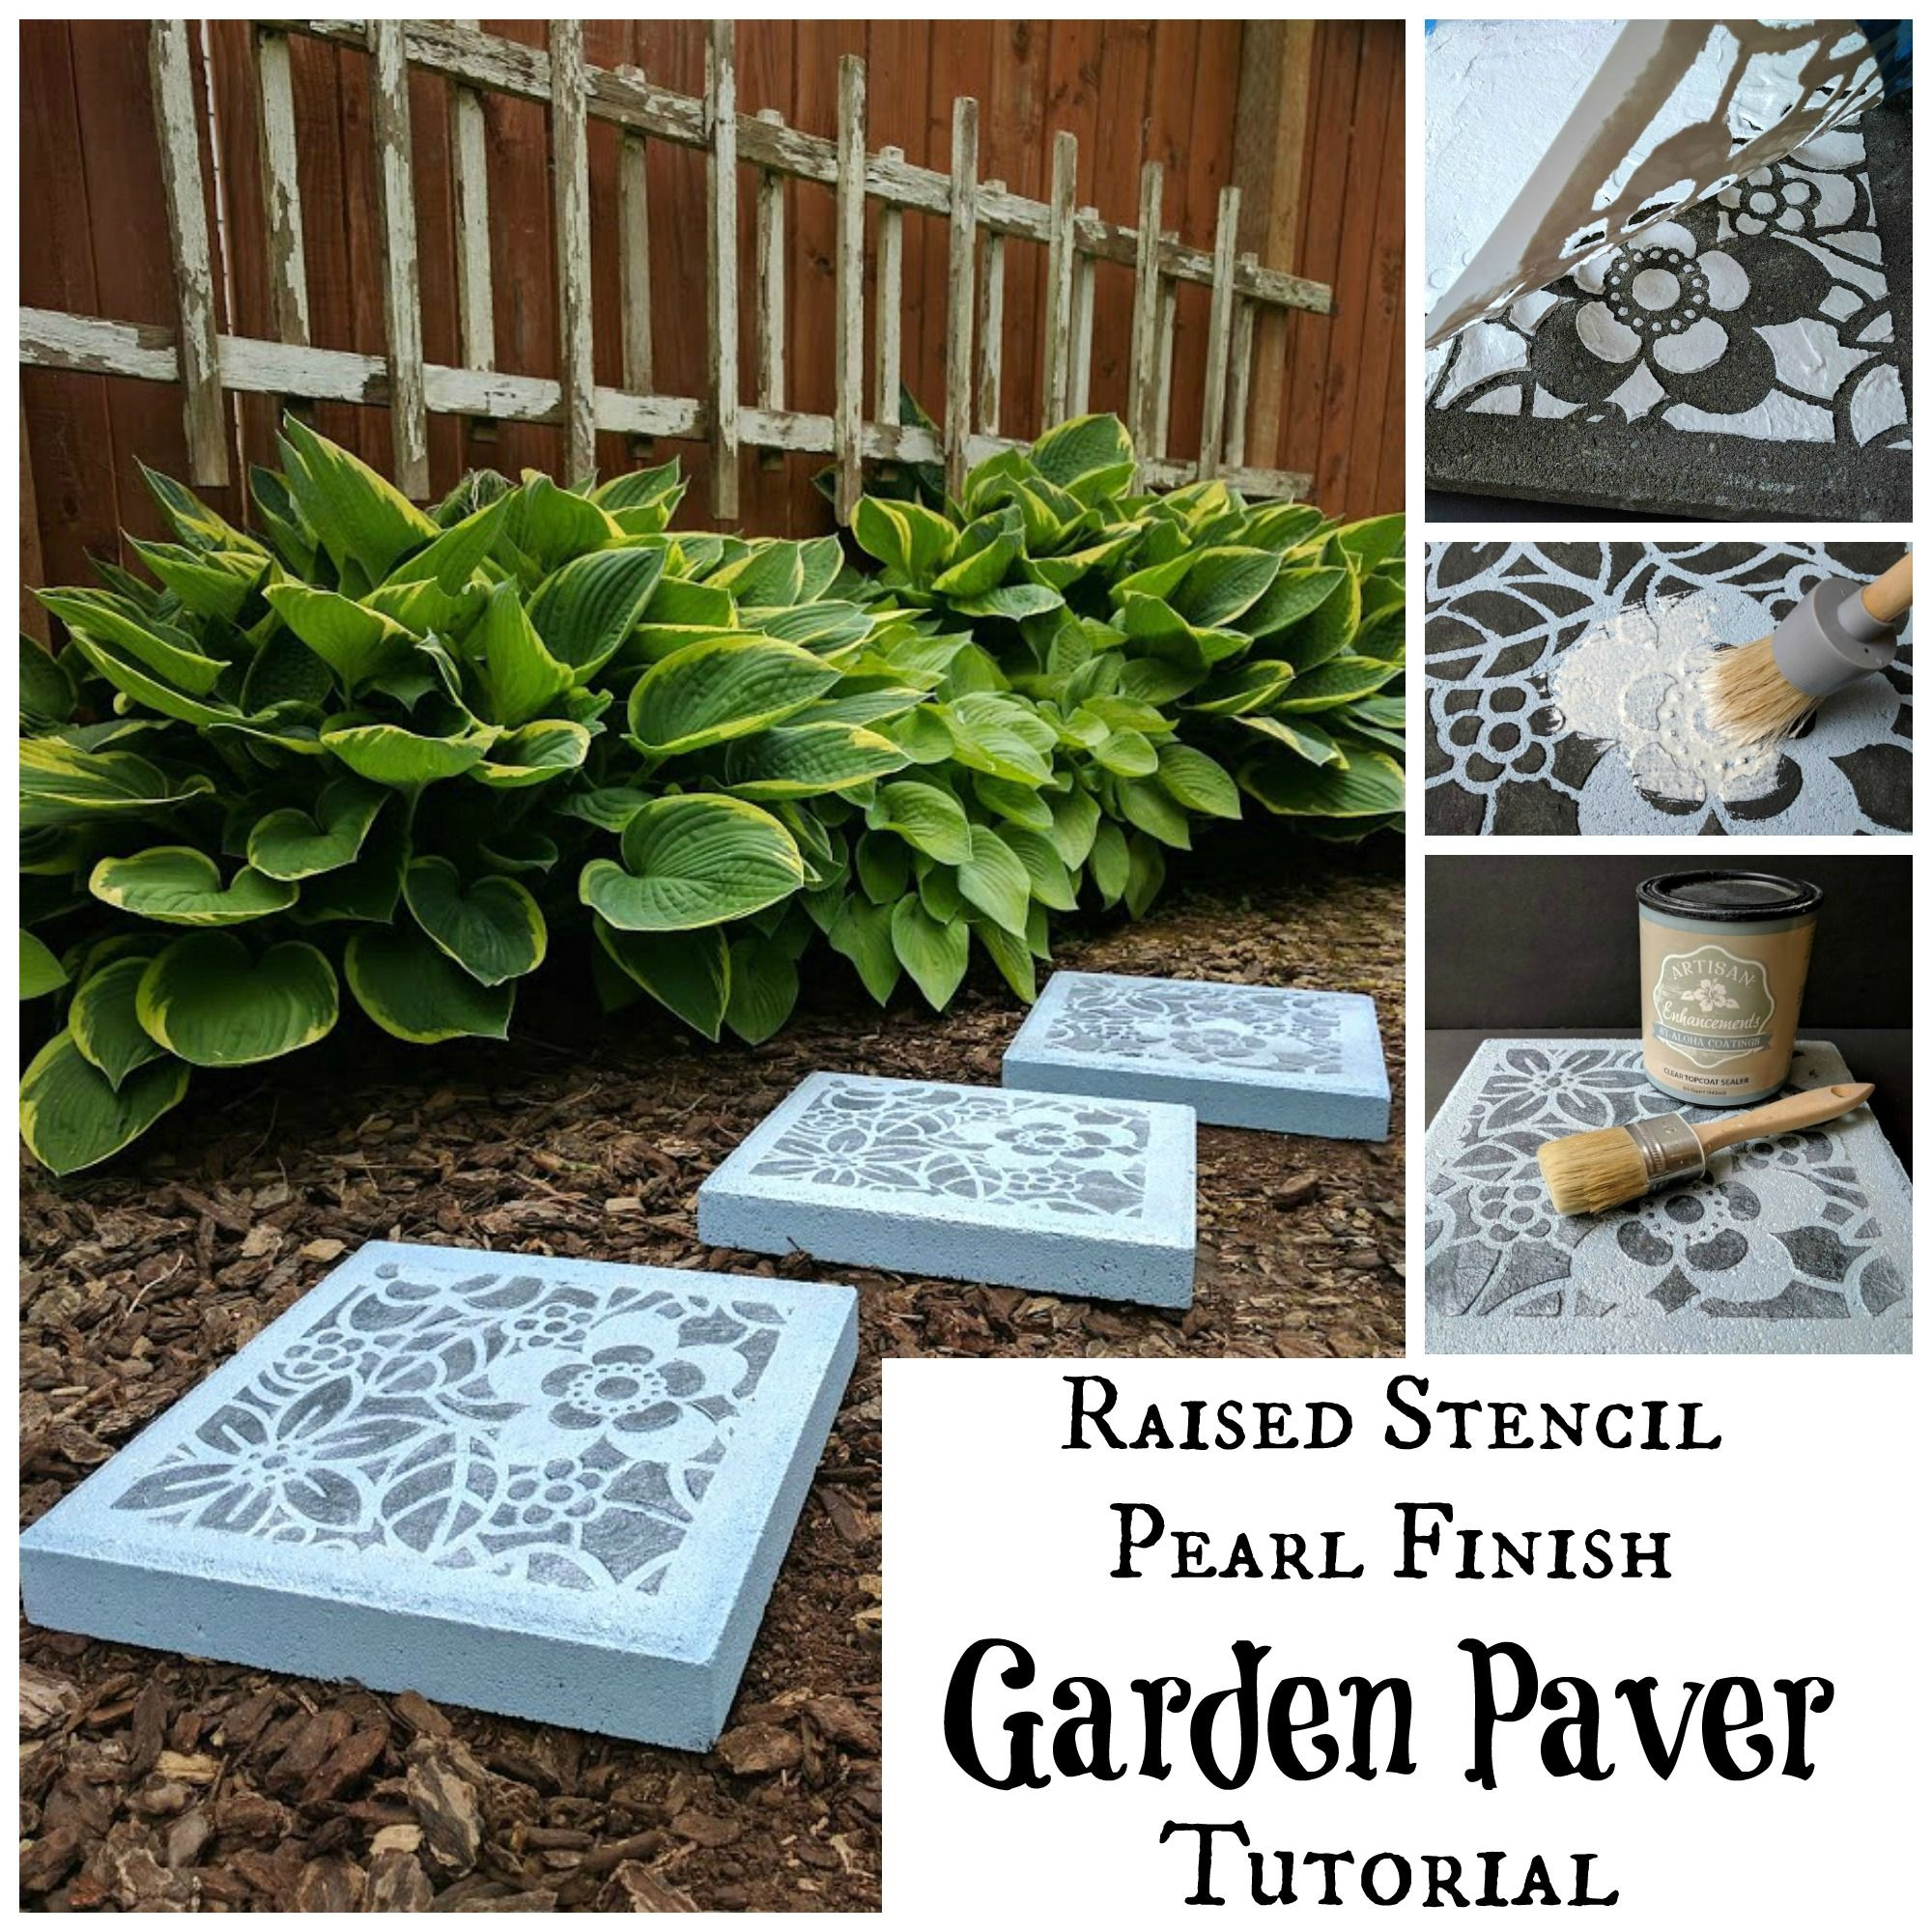 We created a fun raised design on plain garden pavers using Fine ...